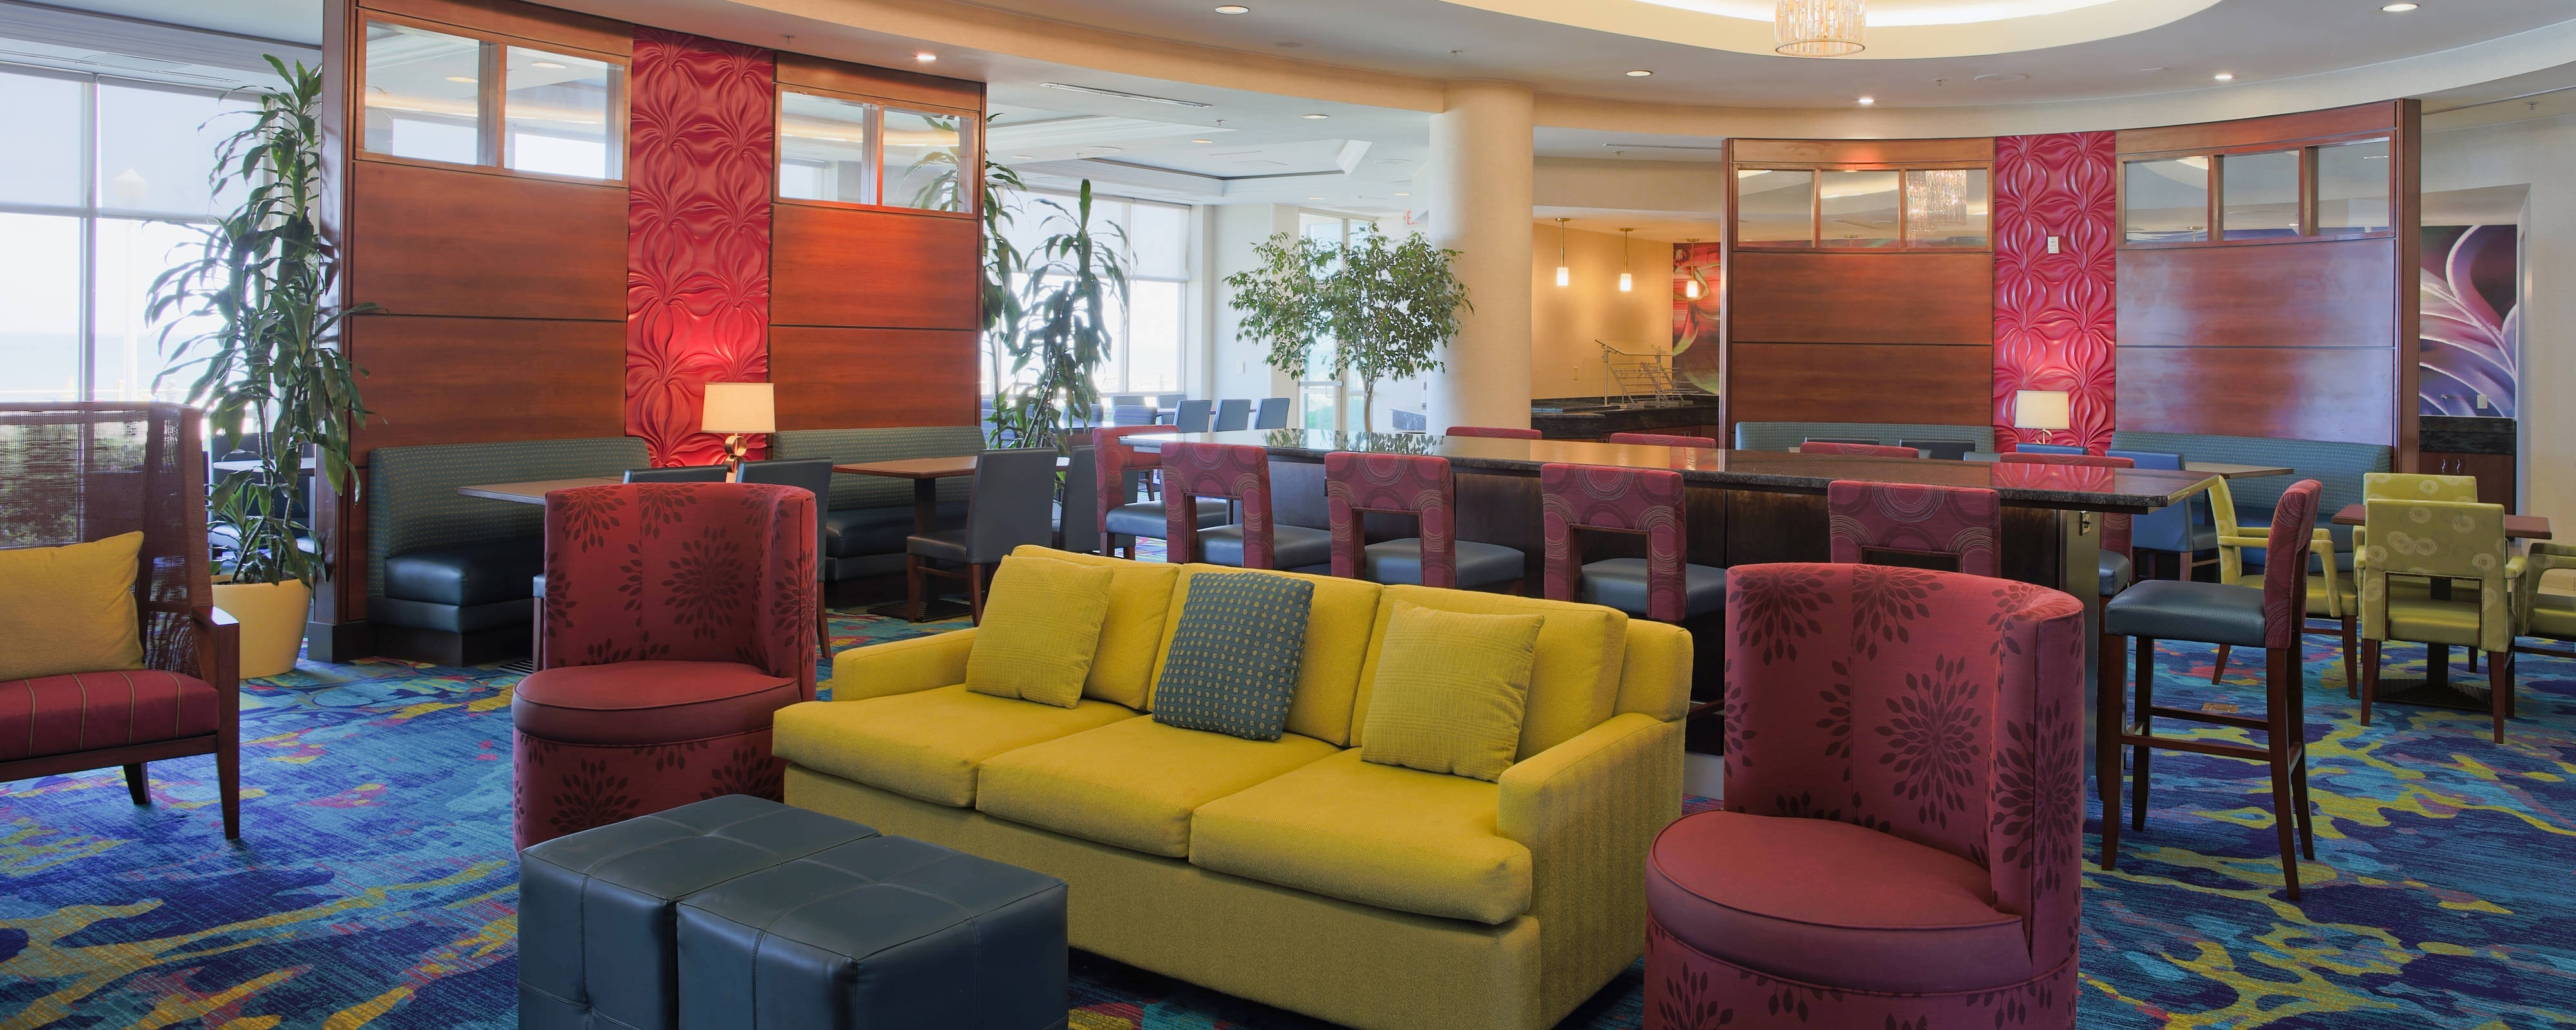 Beach Oceanfront Hotels Virginia Beach Va Springhill Suites